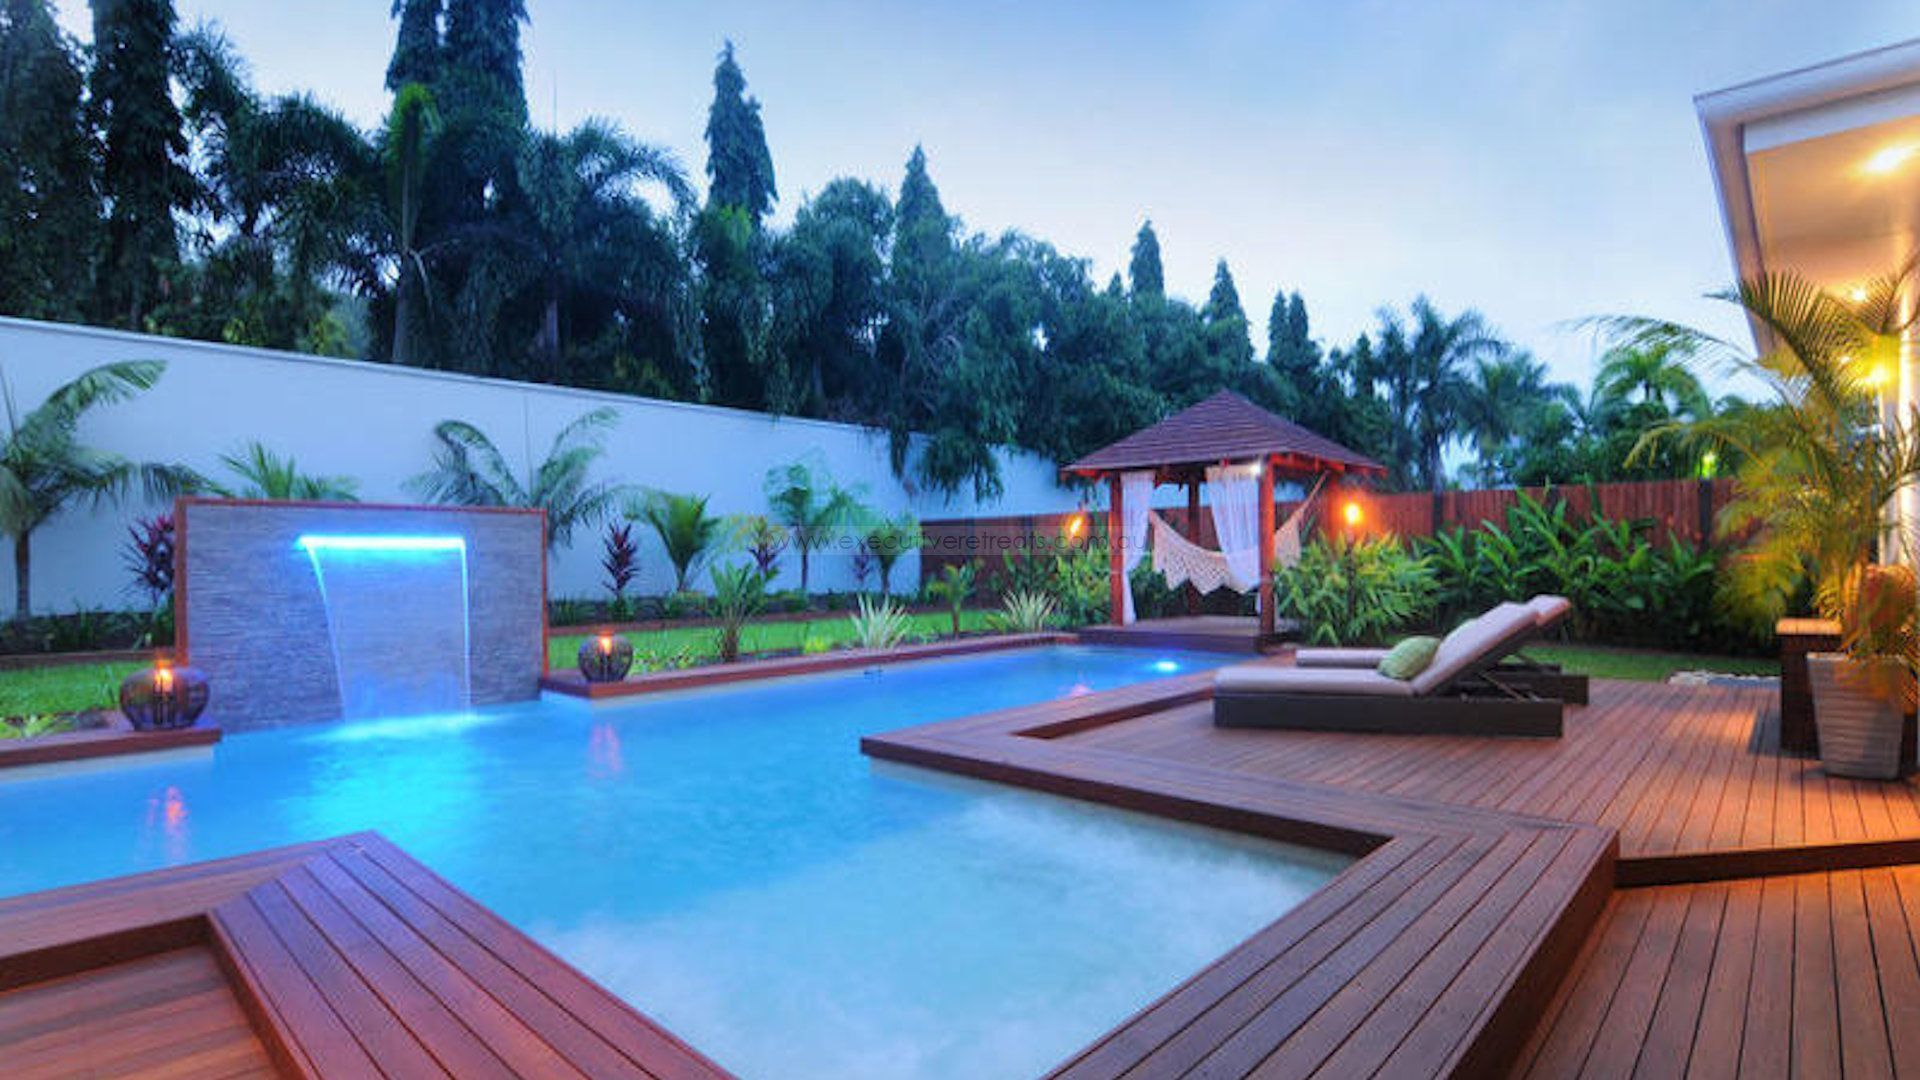 Executive Retreats Holiday Rentals Port Douglas Cairns Palm Cove Daintree Trinity Beach Clifton Mission